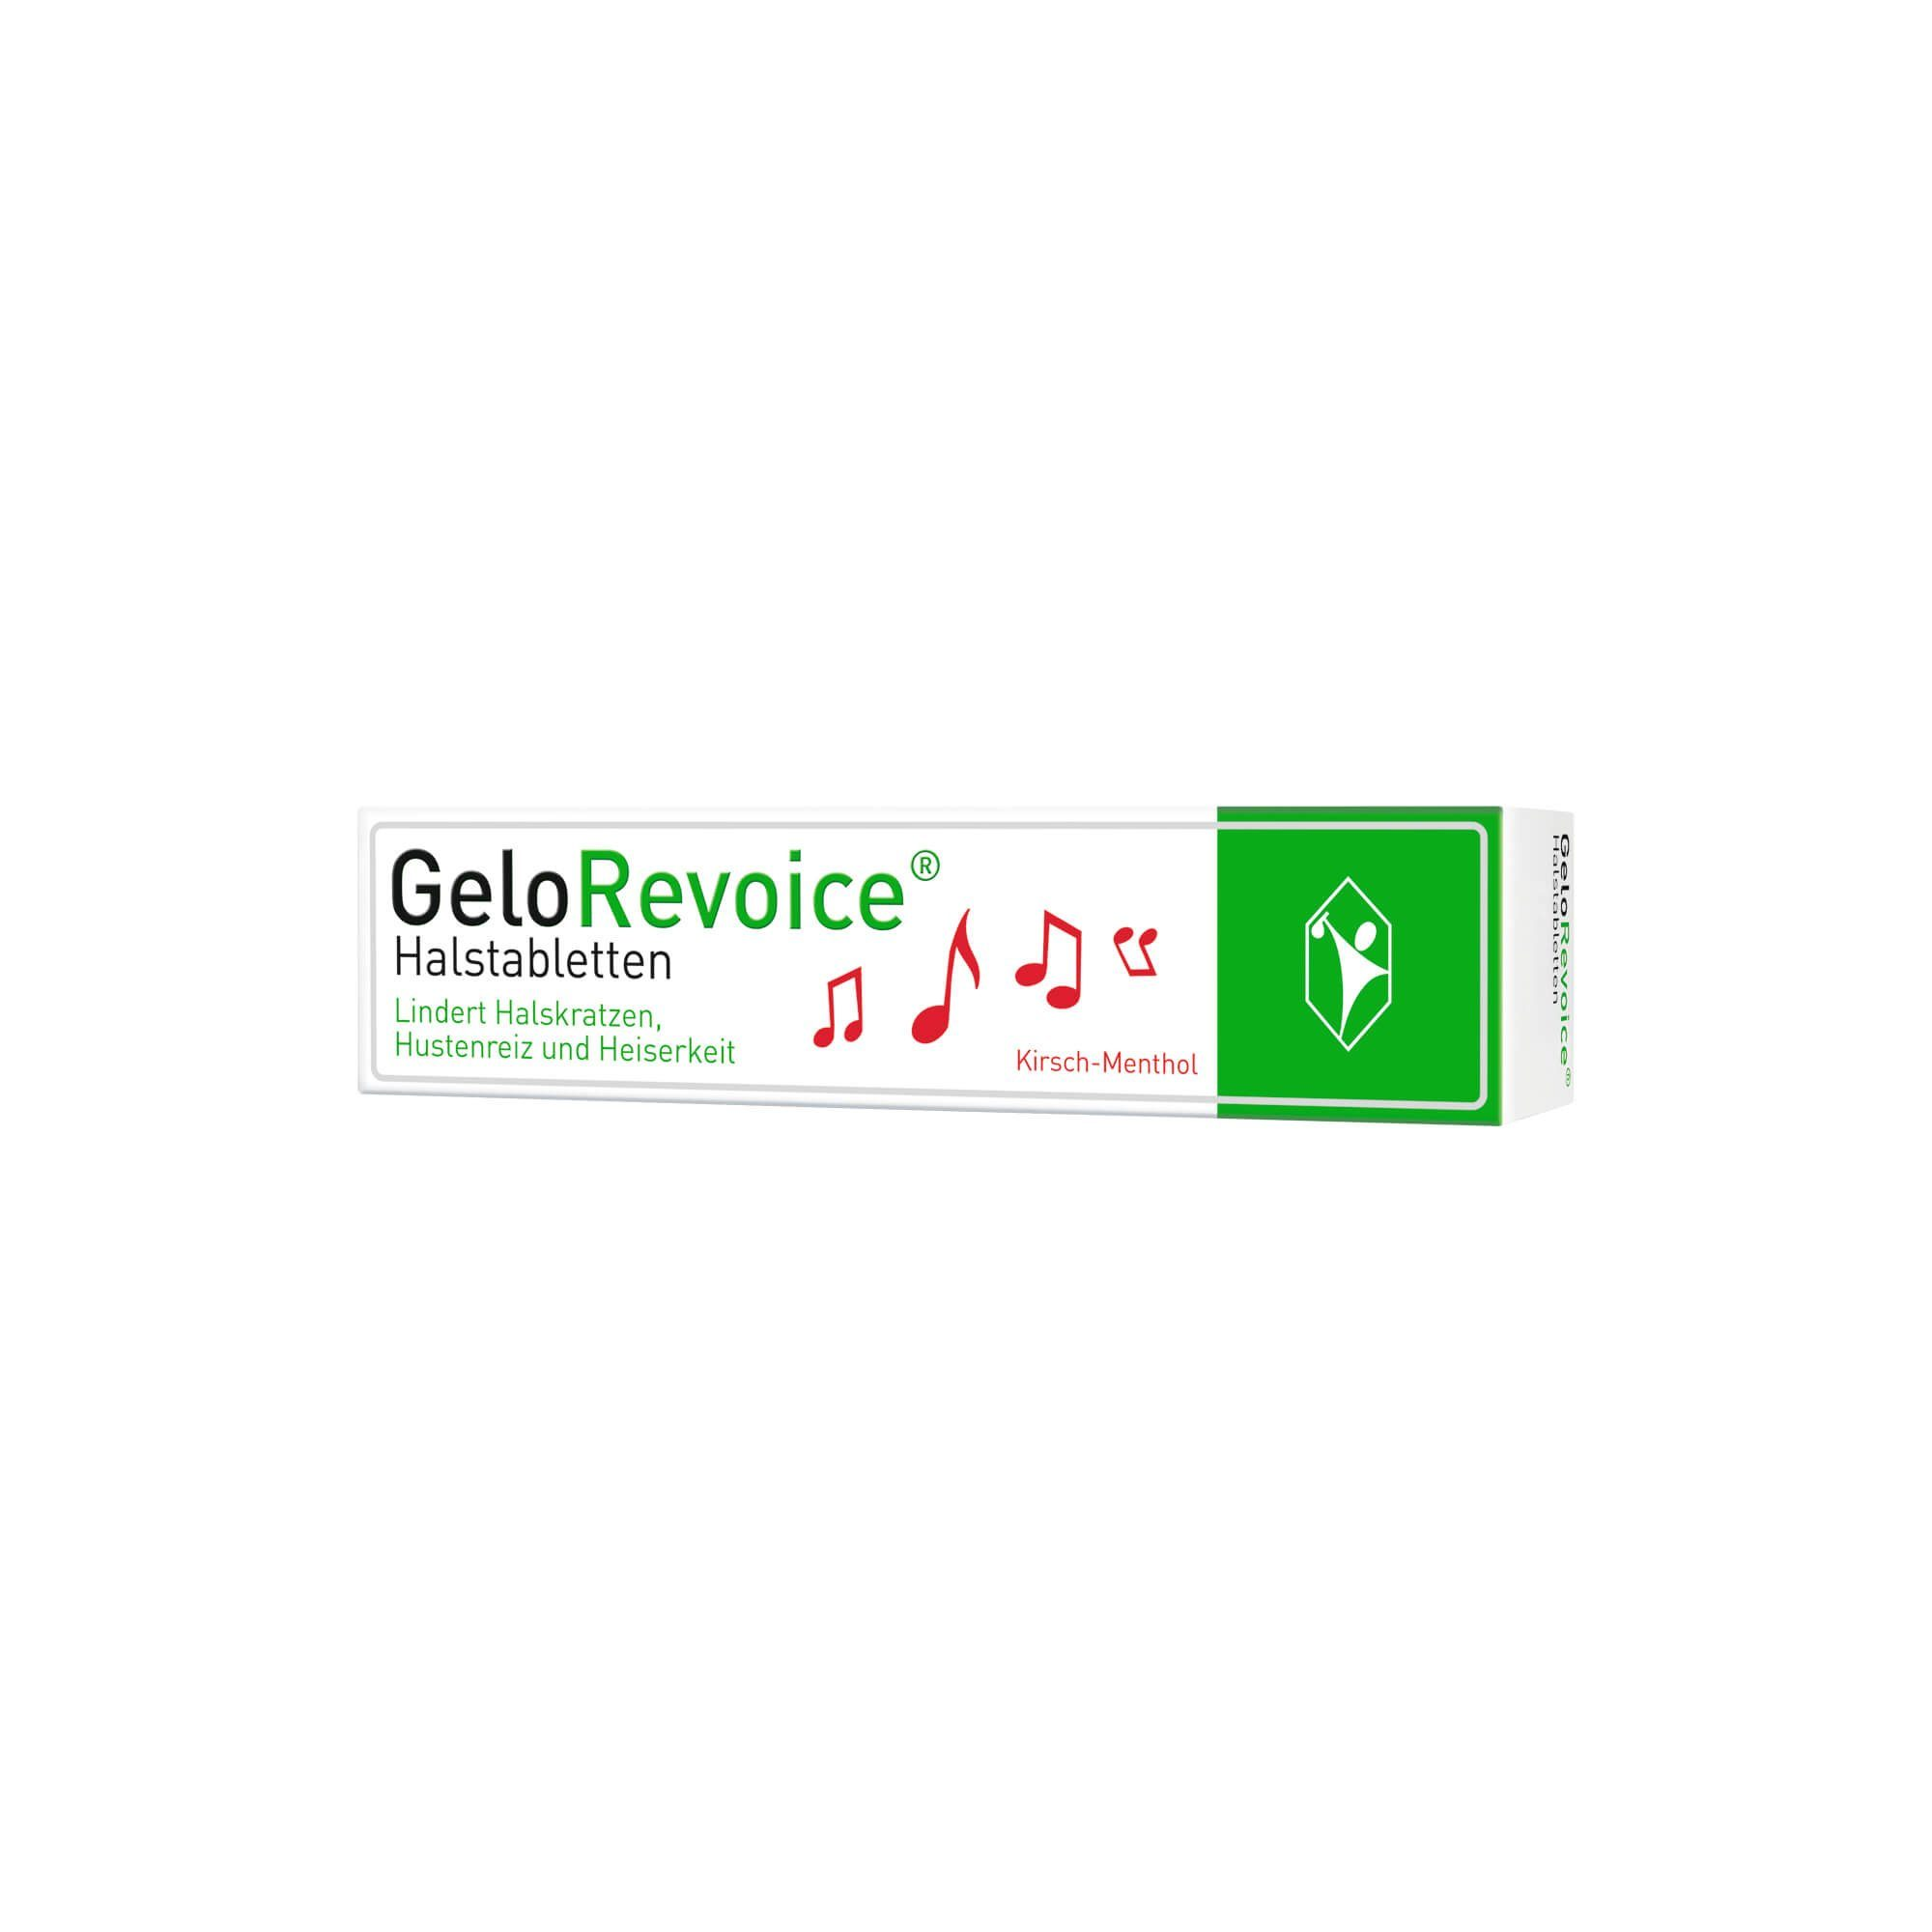 GeloRevoice GeloRevoice Halstabletten Kirsch-Menthol , 20 St